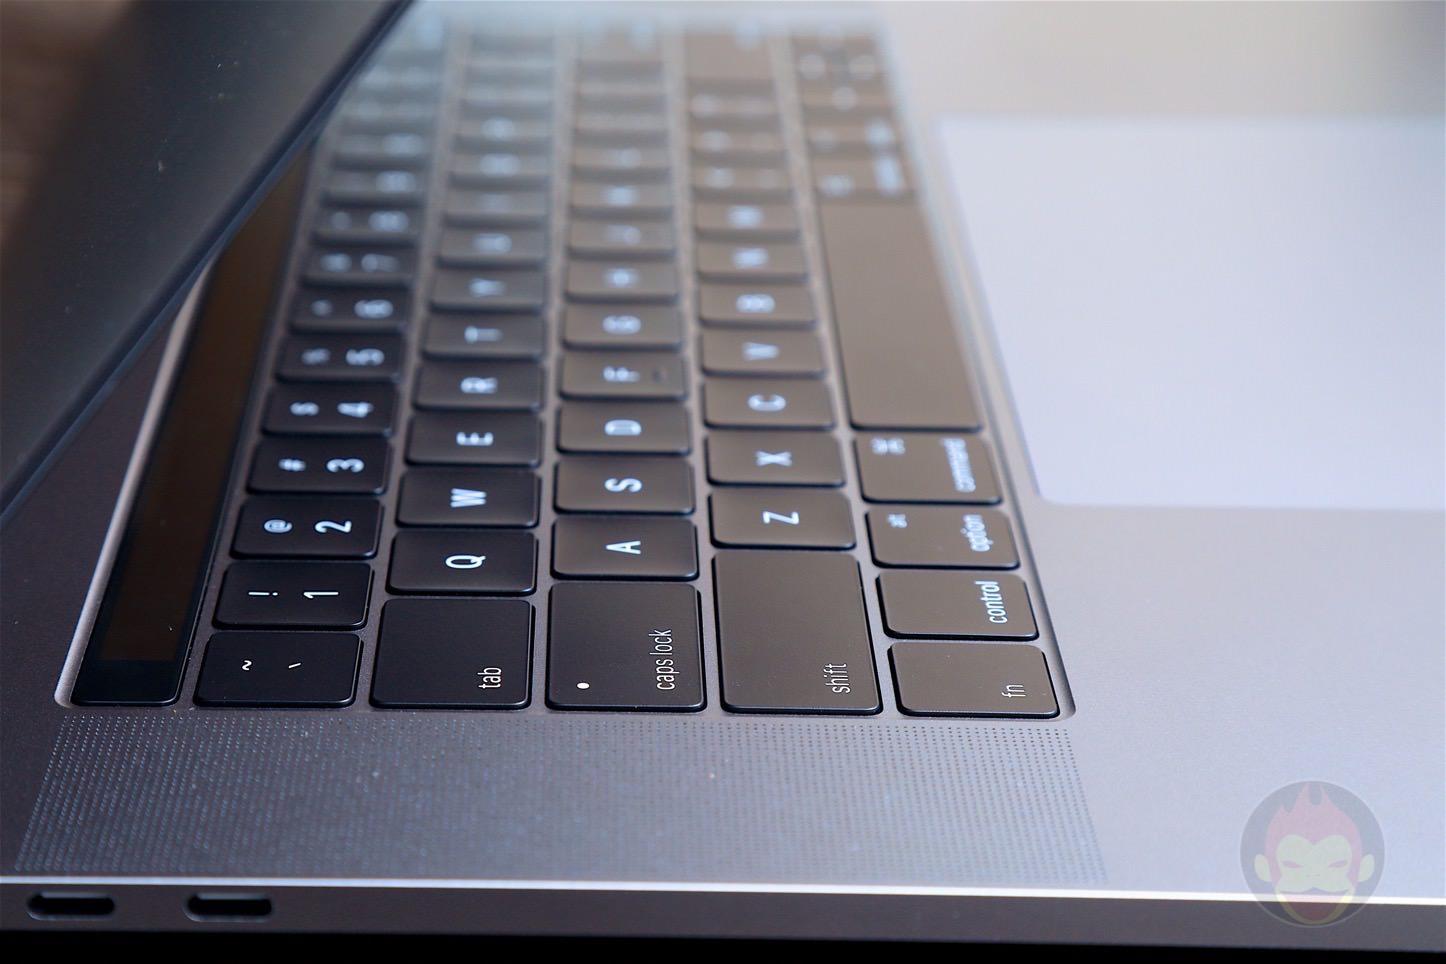 MacBook-Pro-Late-2016-15inch-model-07.jpg